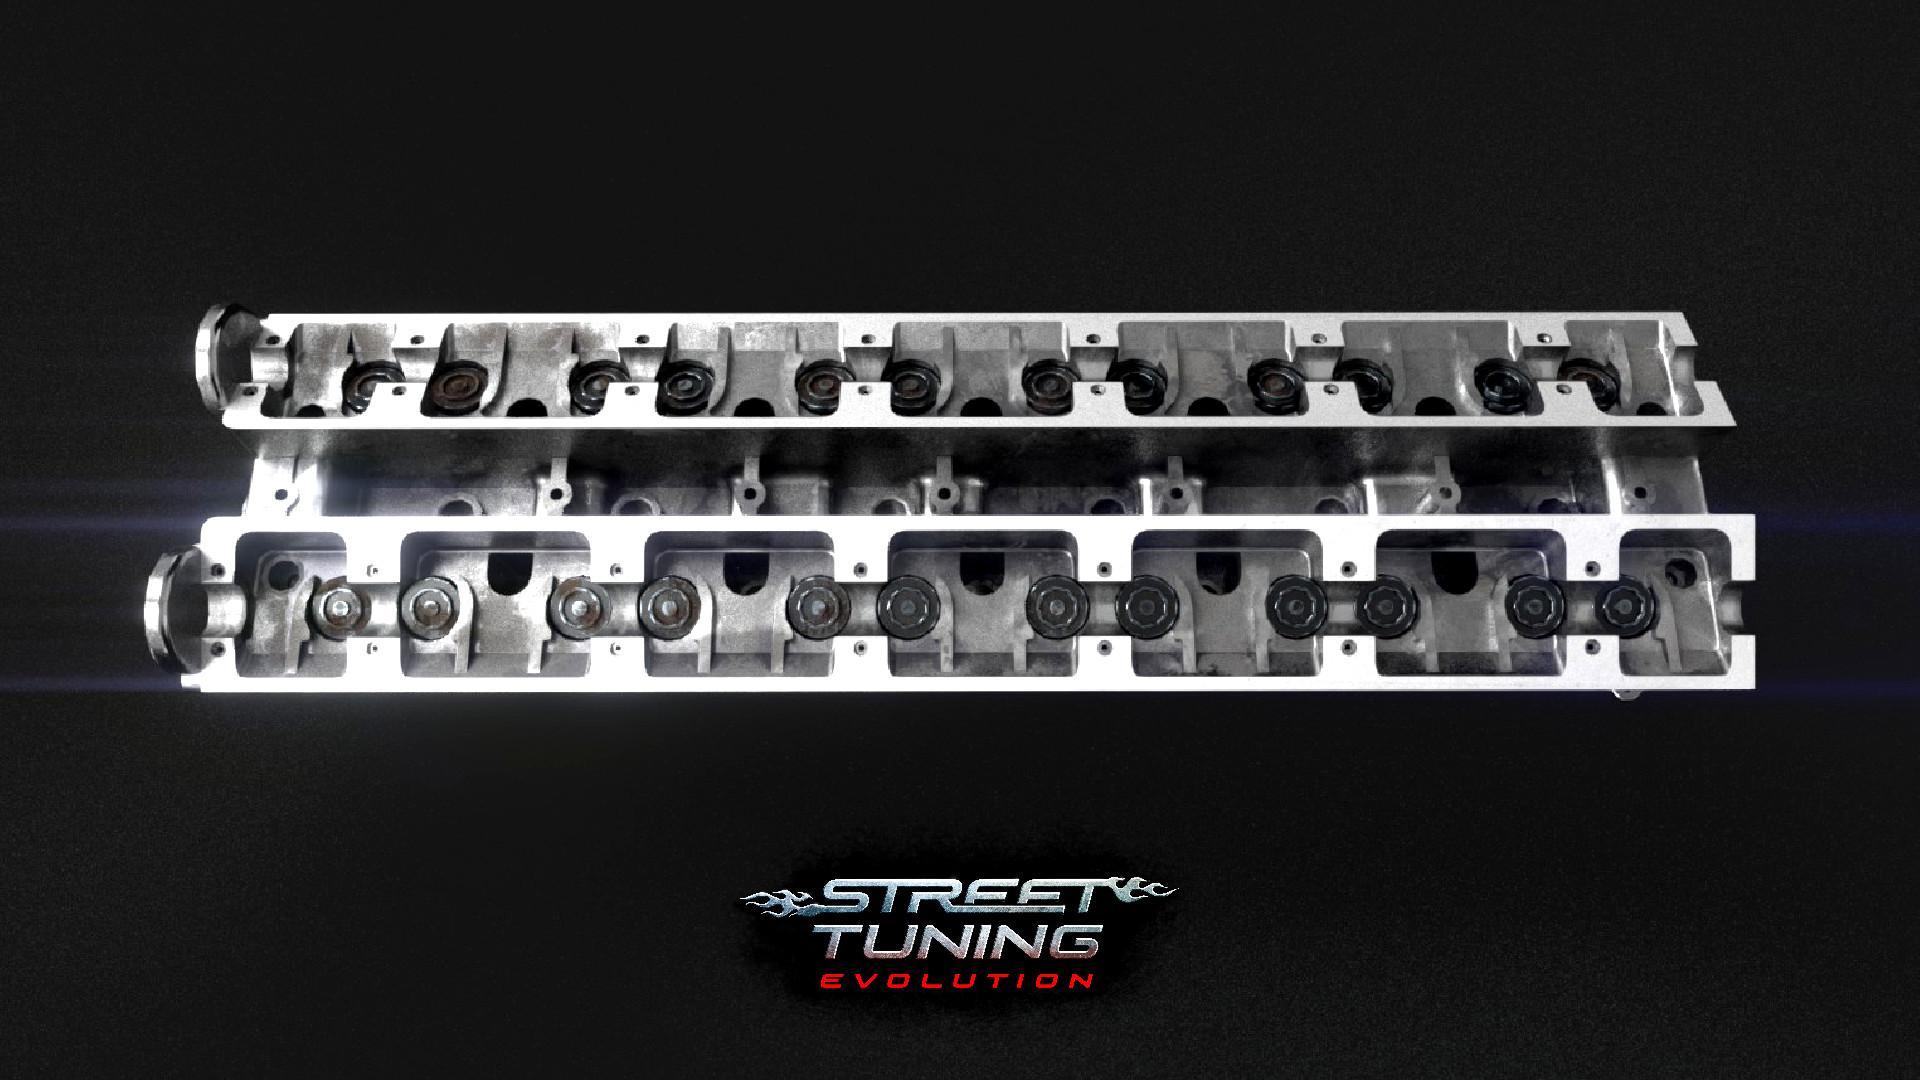 street tuning evolution on